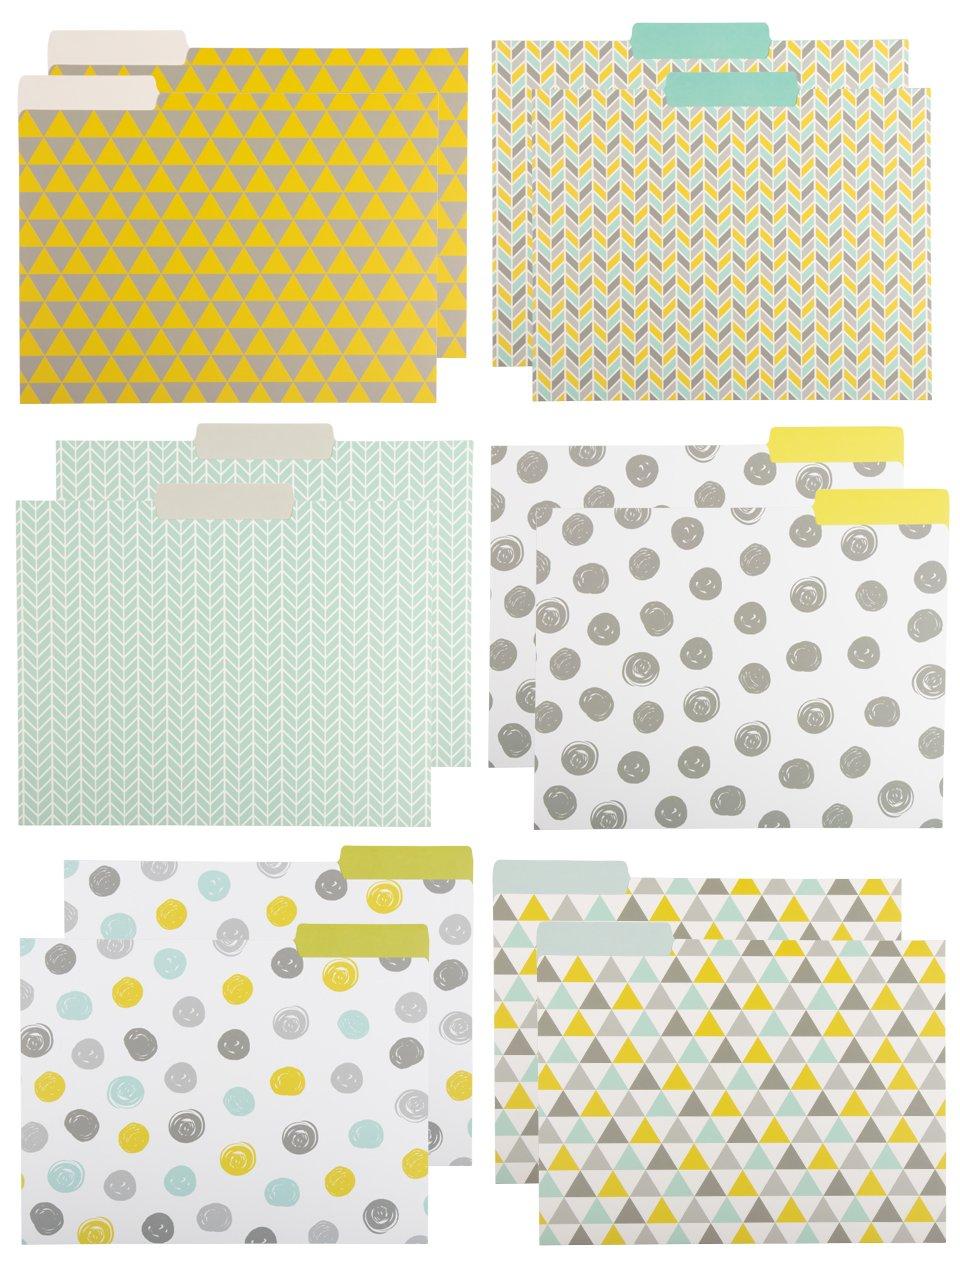 Paper Junkie File Folders - 12-Pack Decorative File Folders, 6 Geometric Colorful File Folders, Designer File Folders - Letter Size 1/3 Cut 1/2 inch Top Memory Tab, 11.5 x 9.5 inches